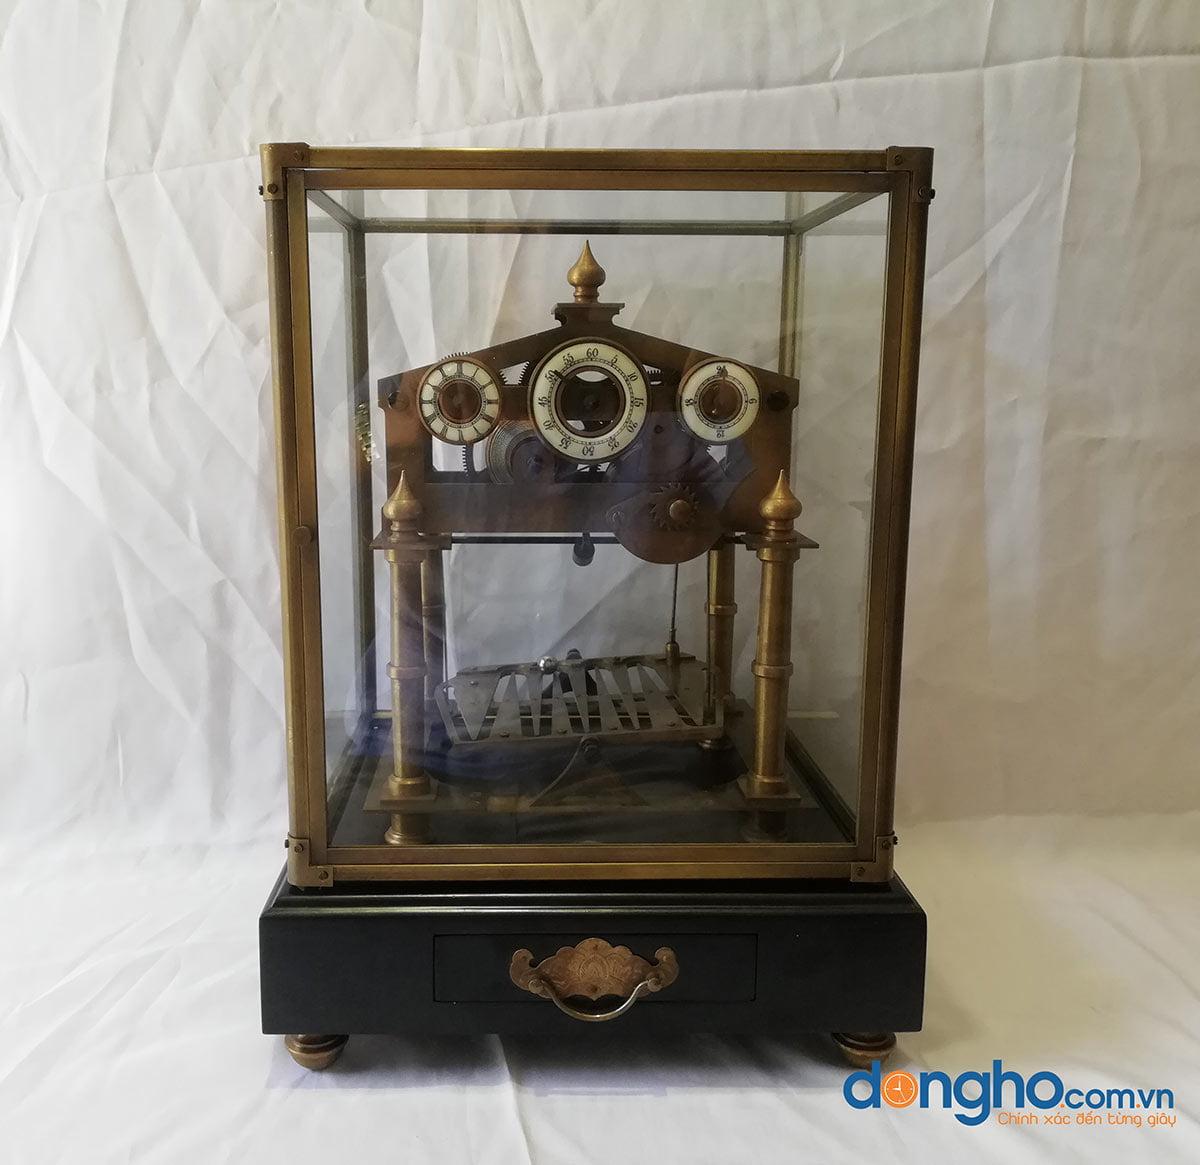 Congreve -Rolling Ball Clock